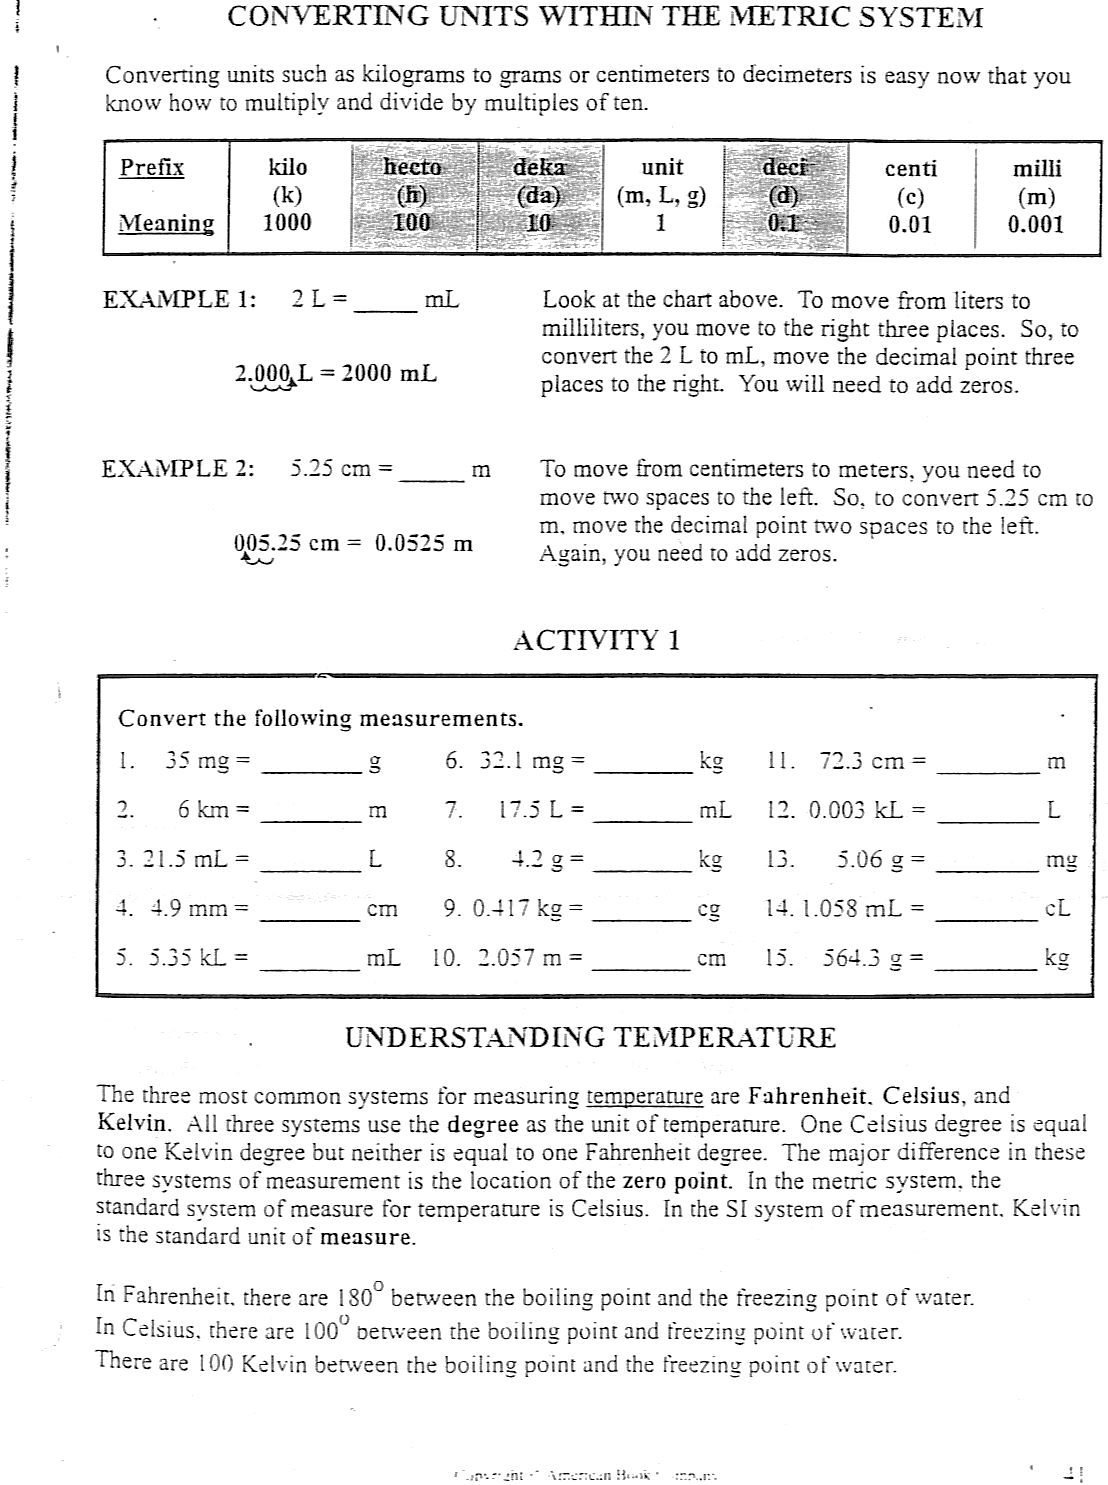 15 Best Images Of High School Science Worksheets